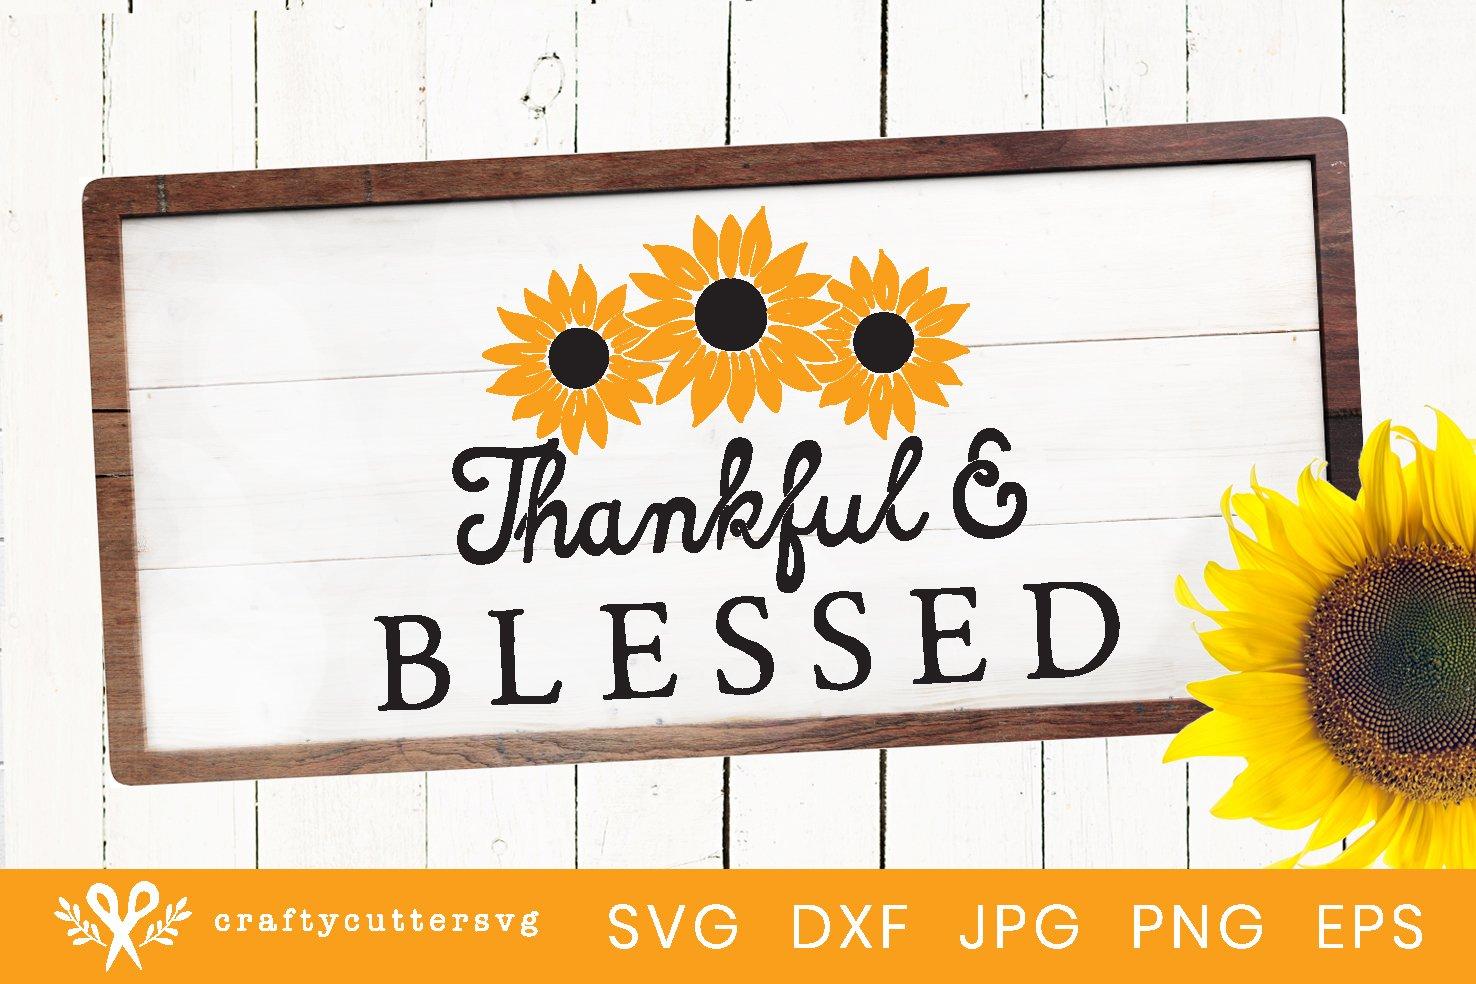 Sunflower Svg | Sunflower Farmhouse Sign Cut File example image 1